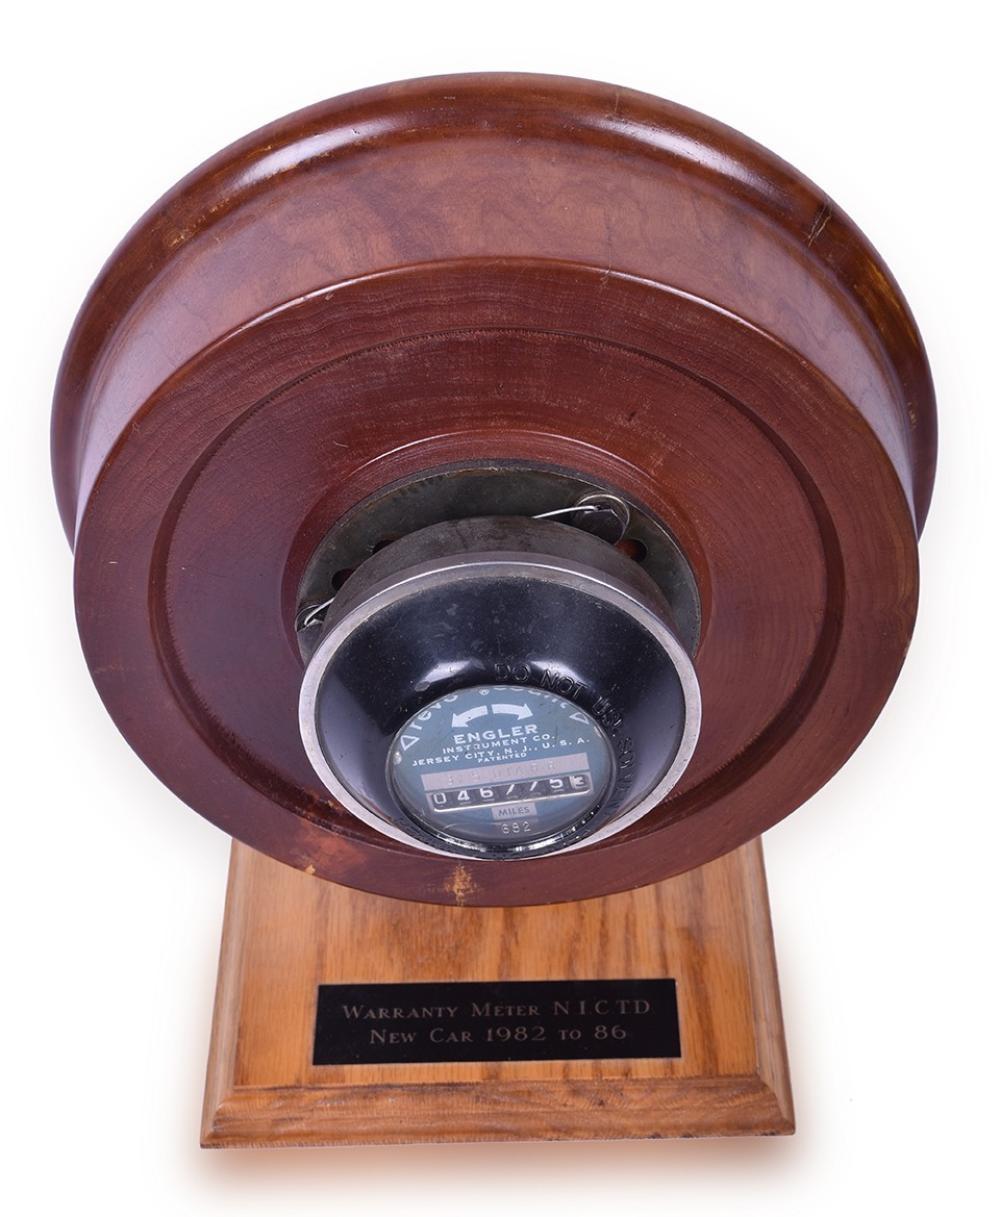 Custom Chicago, South Shore, & South Bend Railroad Nippon Sharyo Car Warranty Meter Display